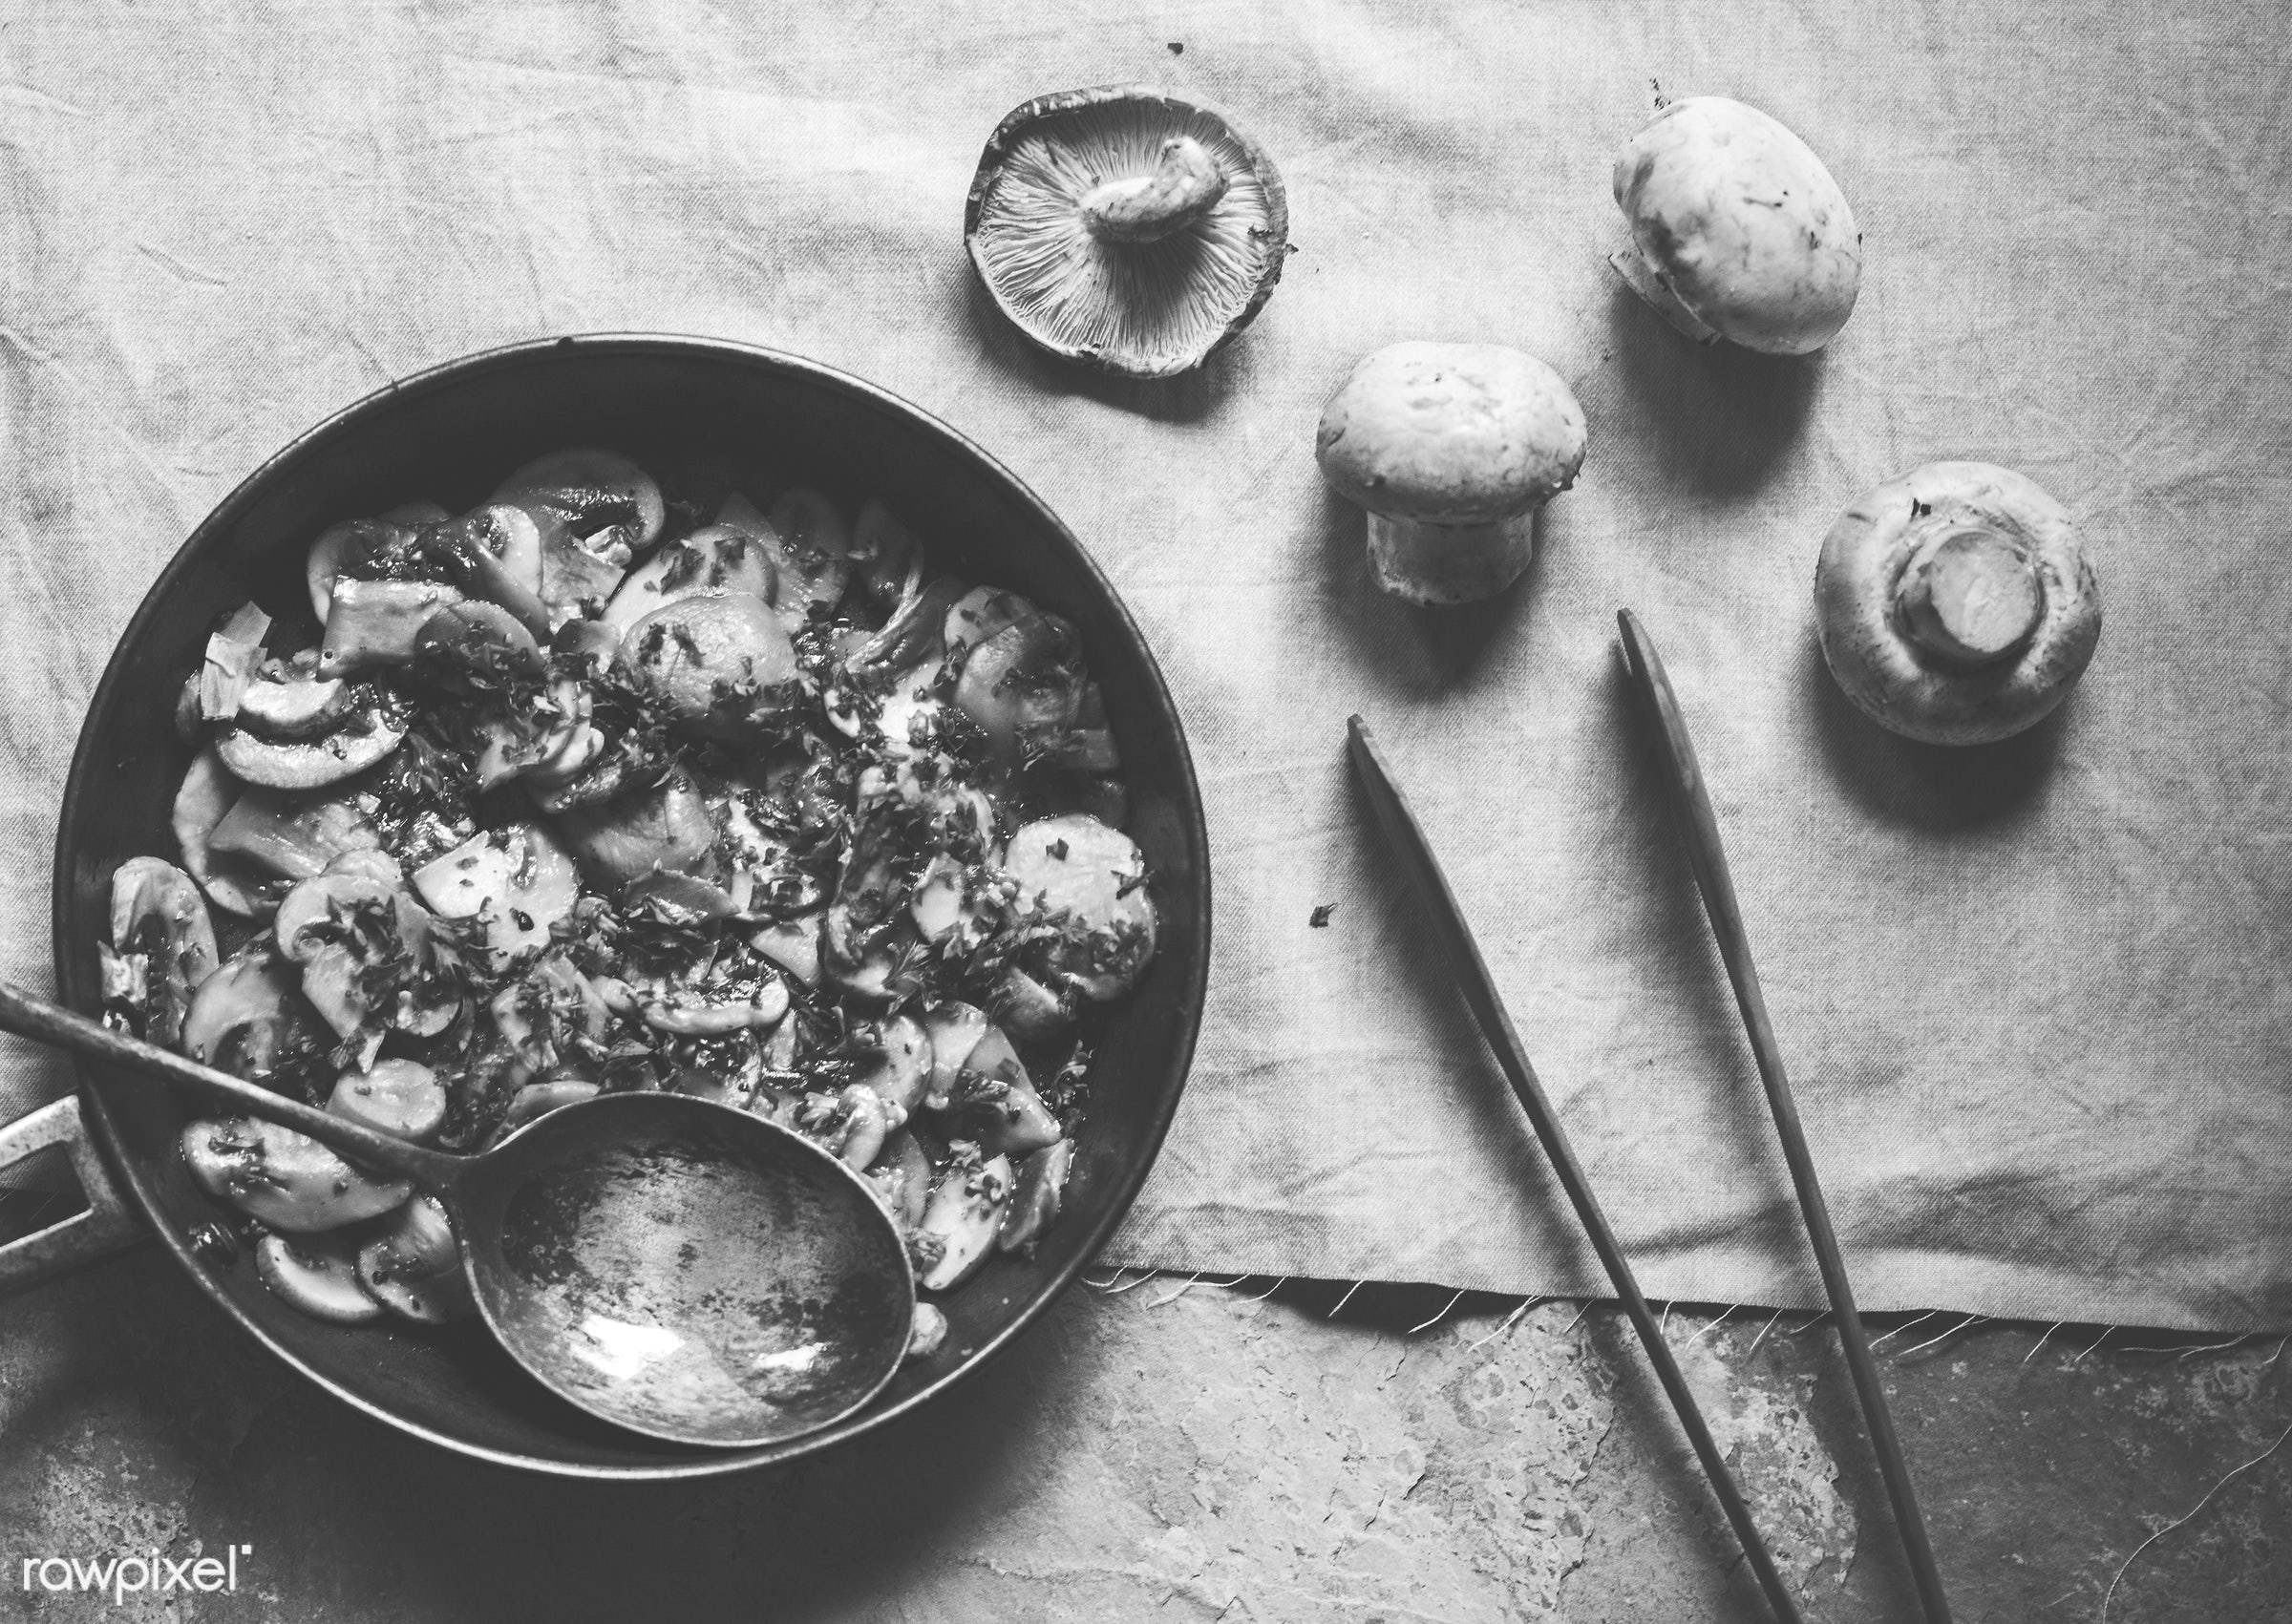 raw, mushroom, nutritious, sauteed, gastronomy, fresh, vegetarian, cooking, ingredient, gourmet, tong, nourishment, flavor,...